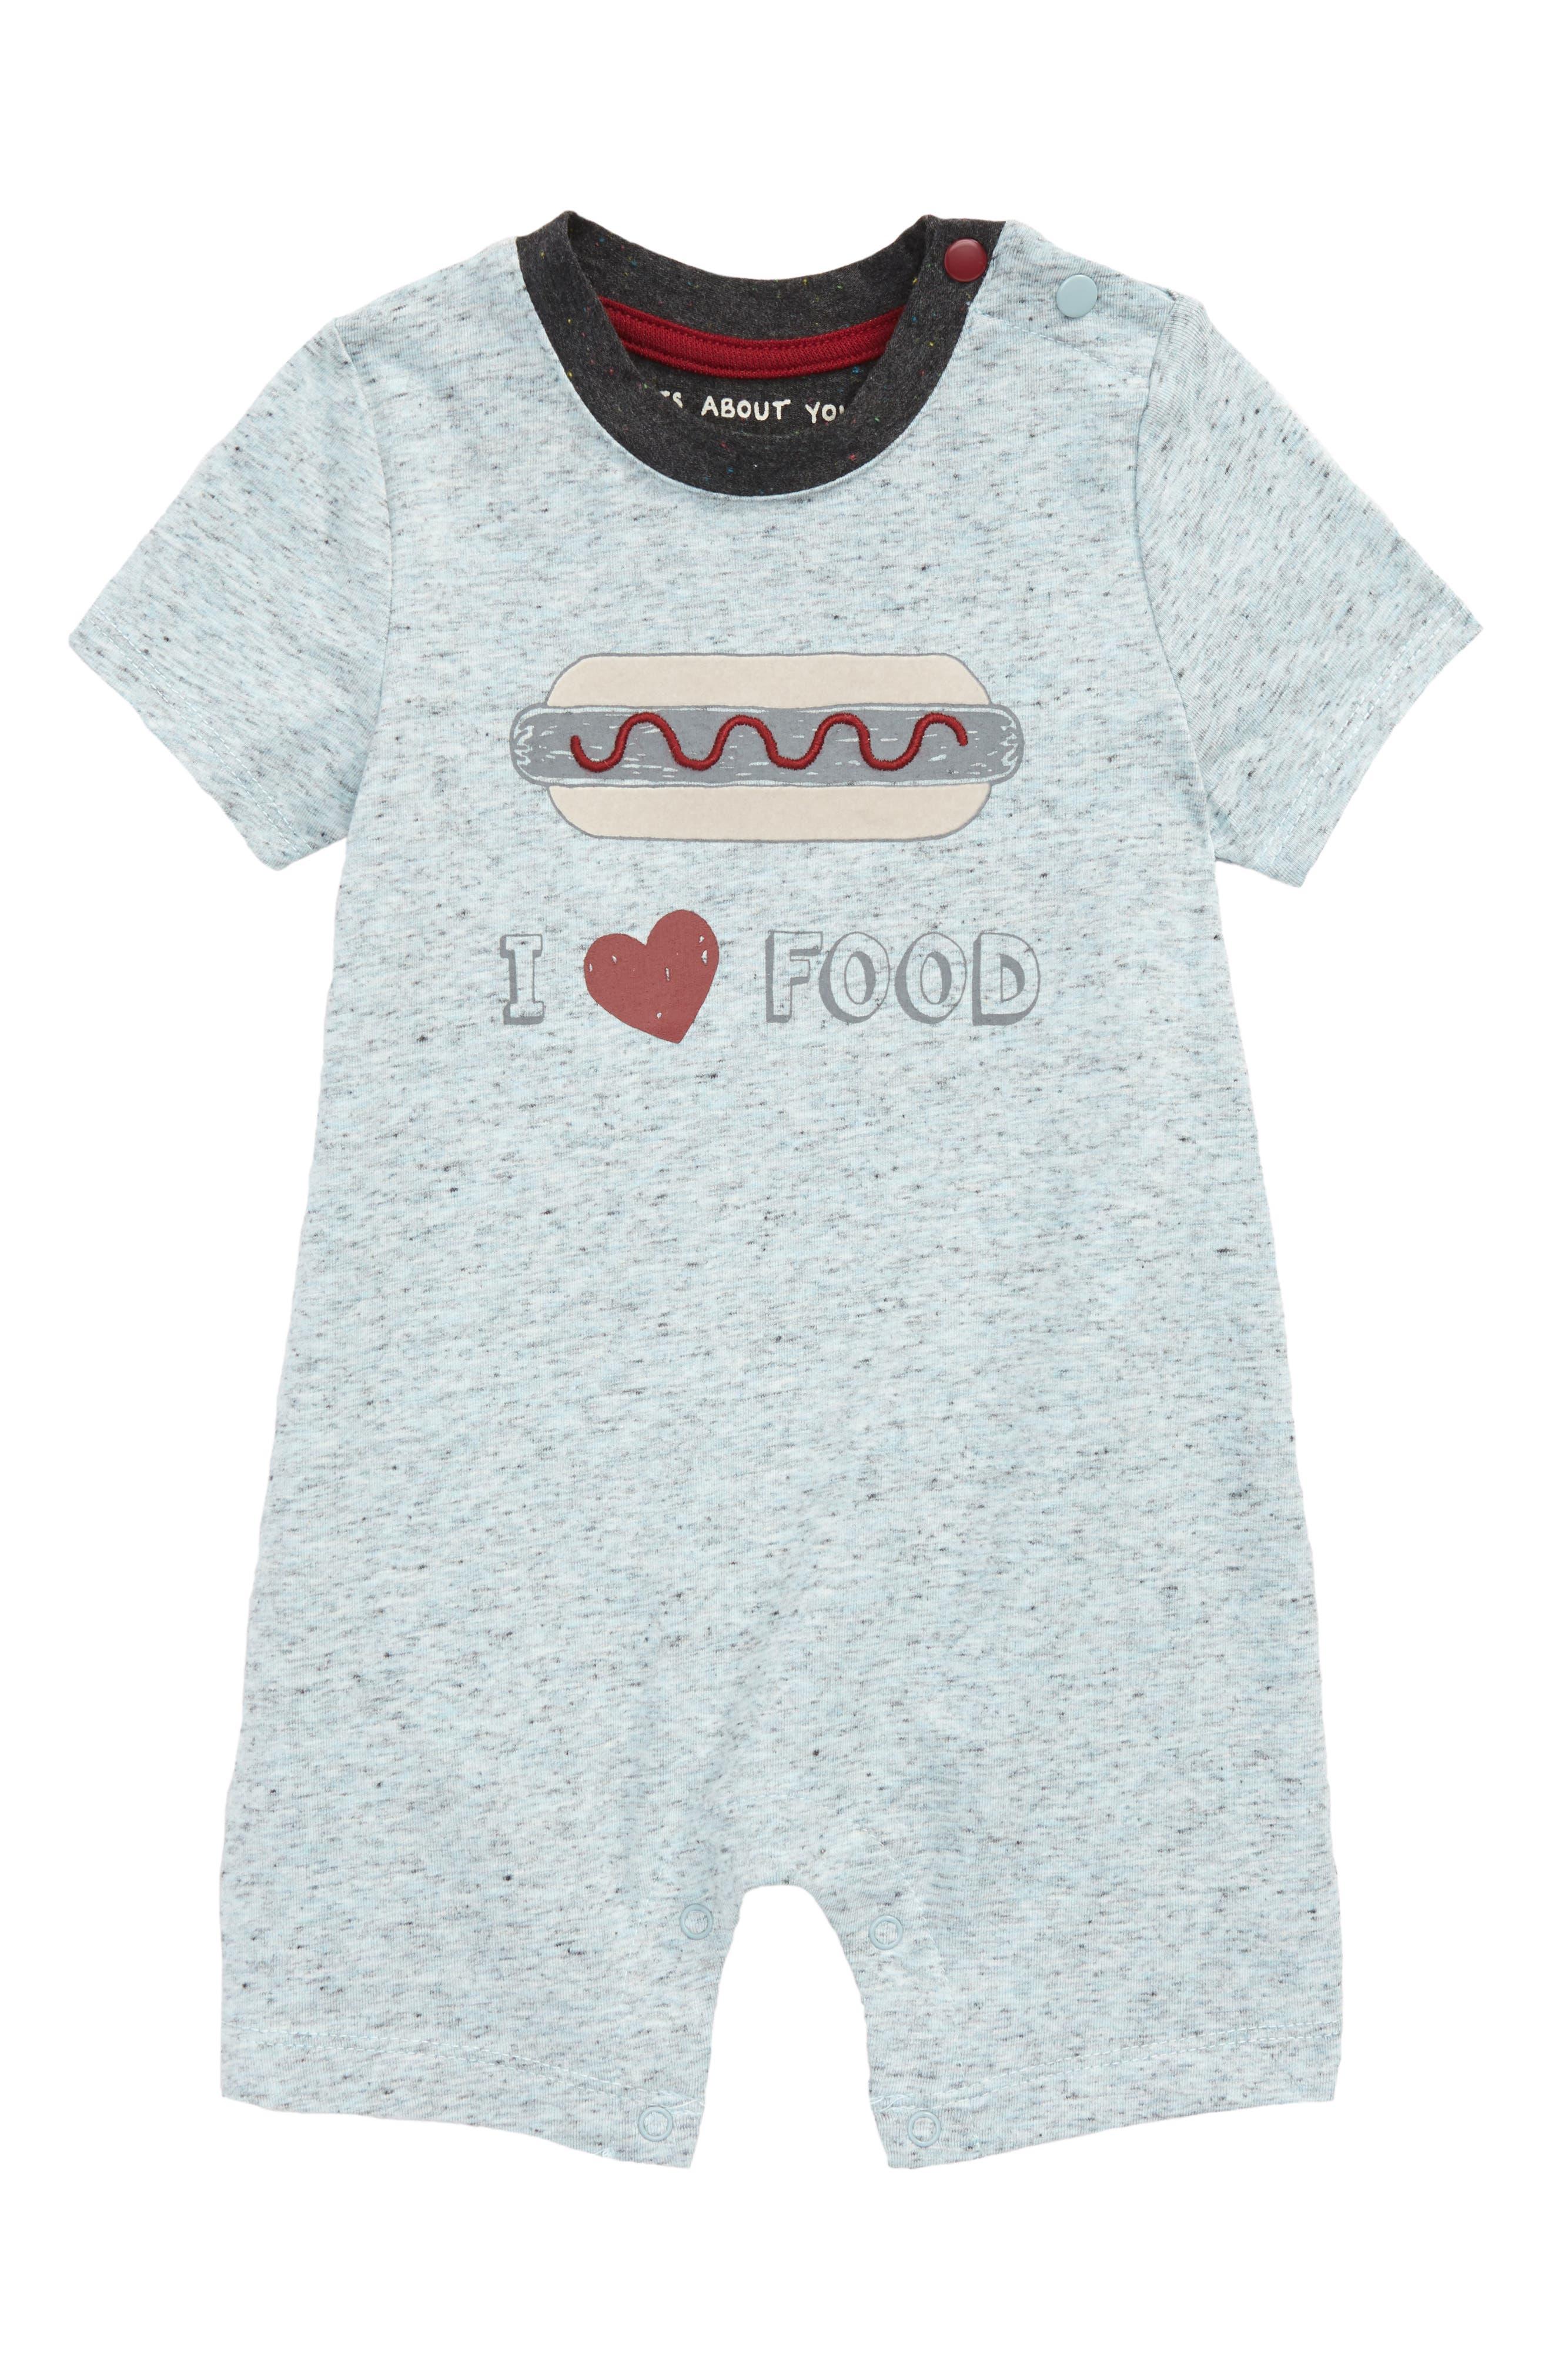 Main Image - Robeez® I Love Food Romper (Baby)